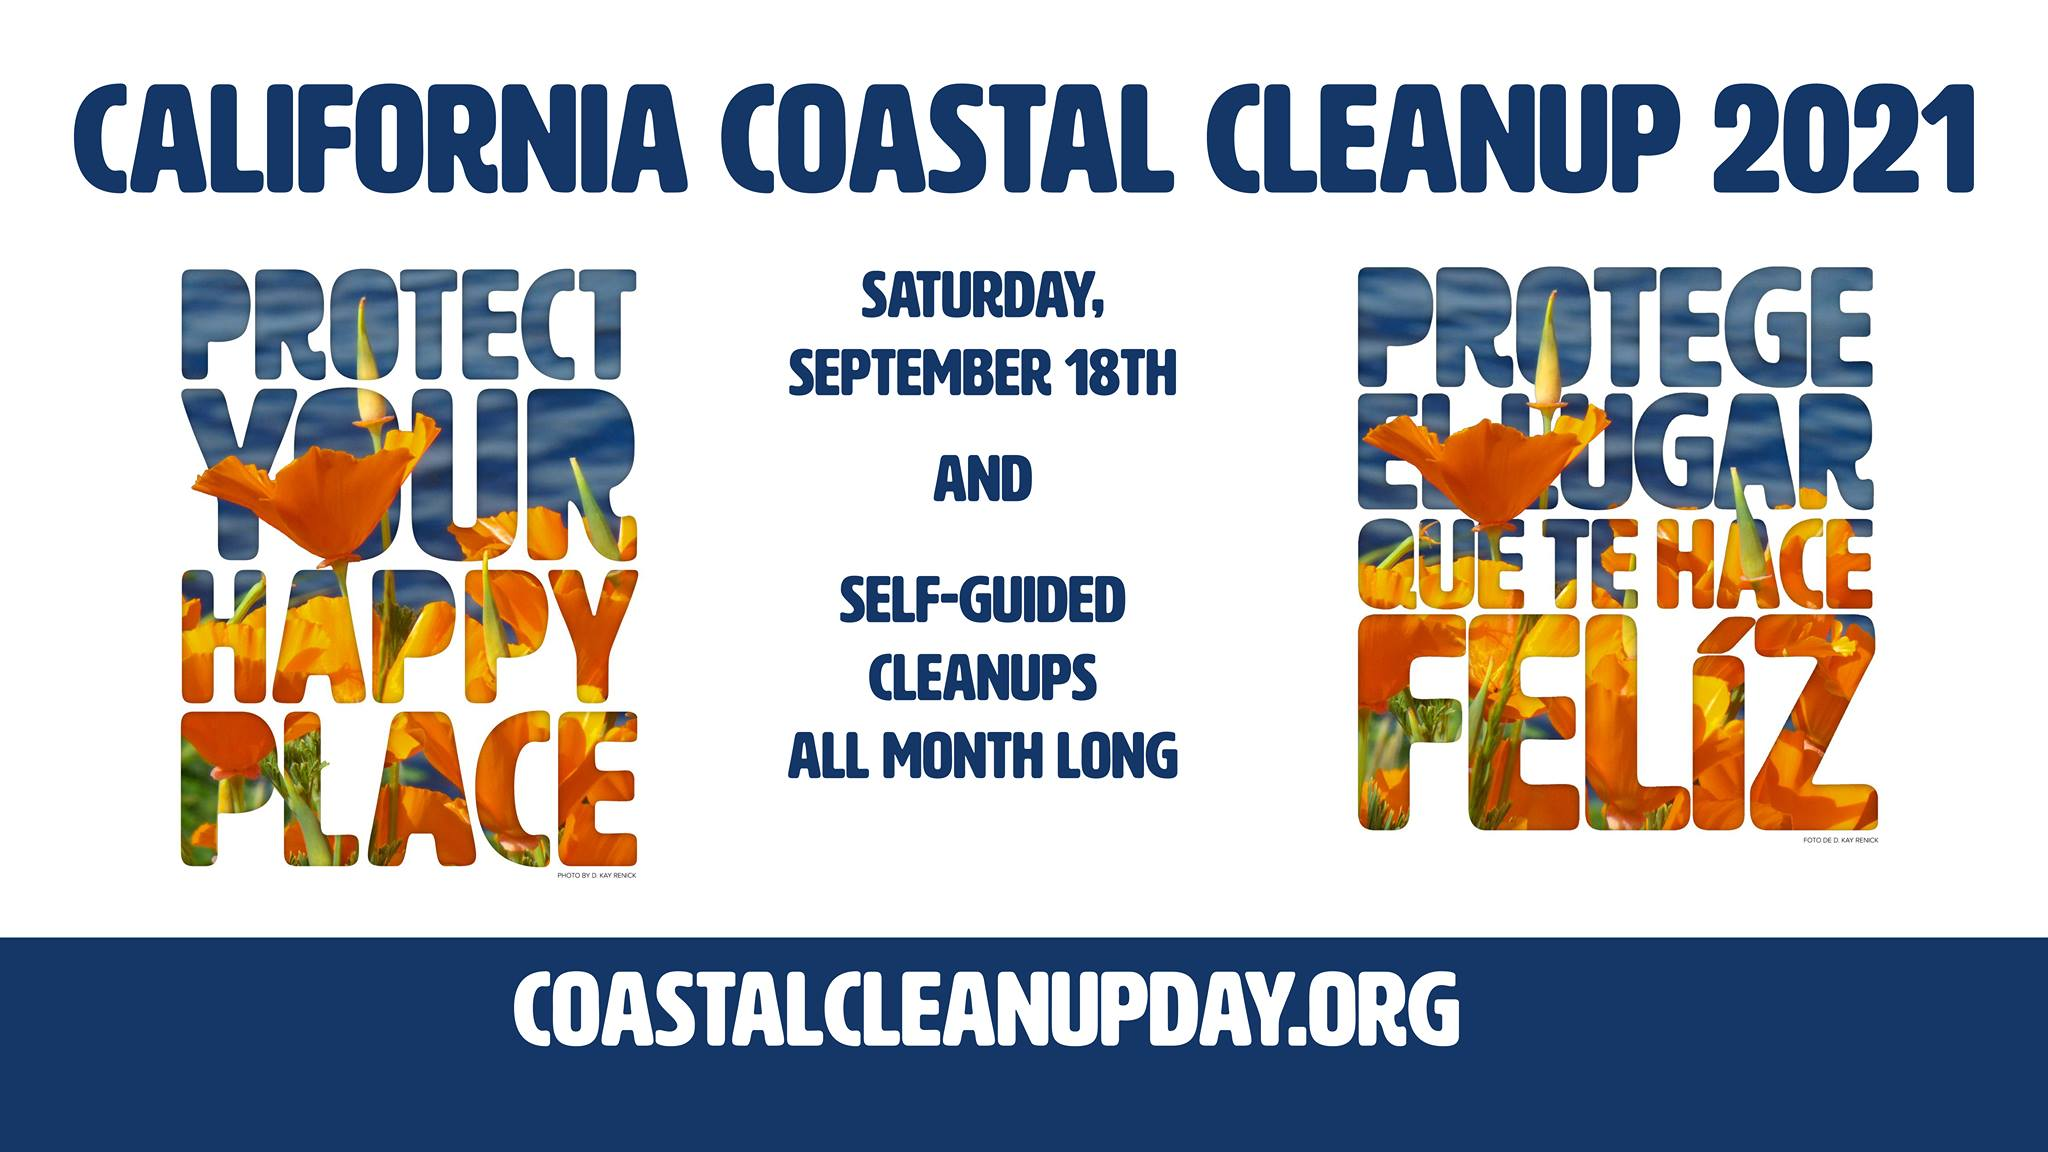 California Coastal Cleanup 2021 banner